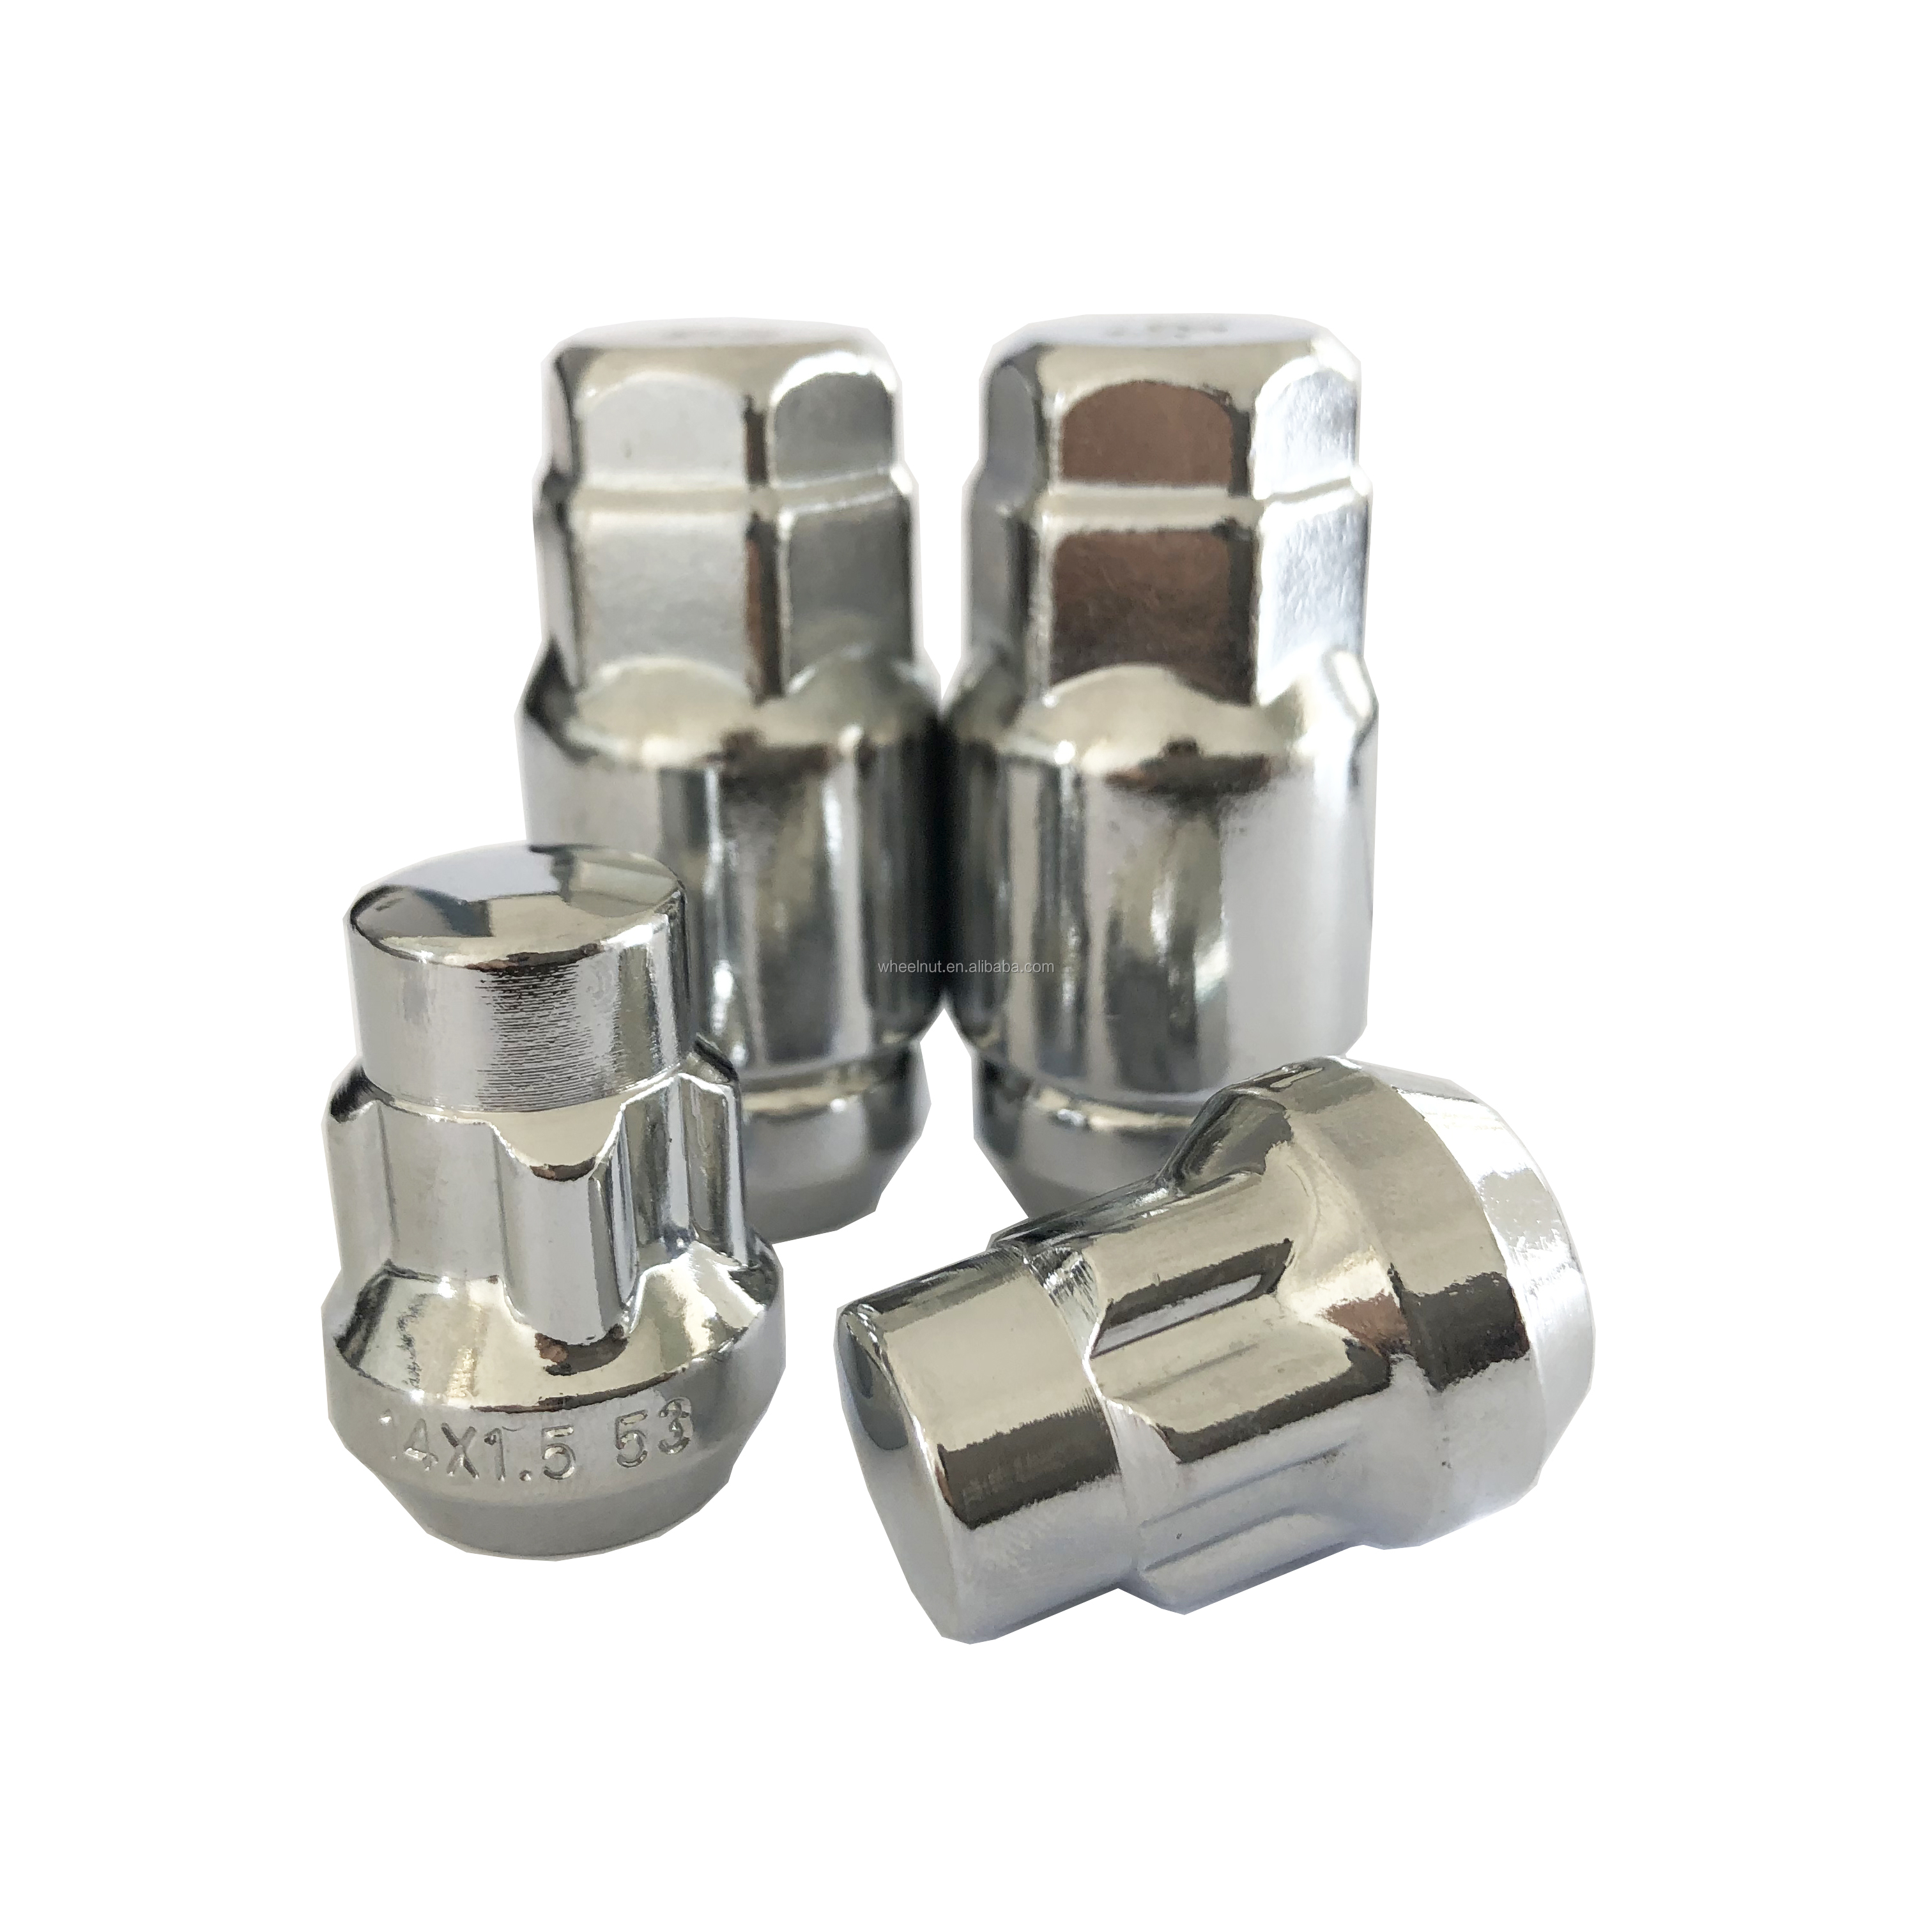 set of 4,12m x 1.5 locking mag wheel chrome lug nuts,with key 3//4 shank,ML3